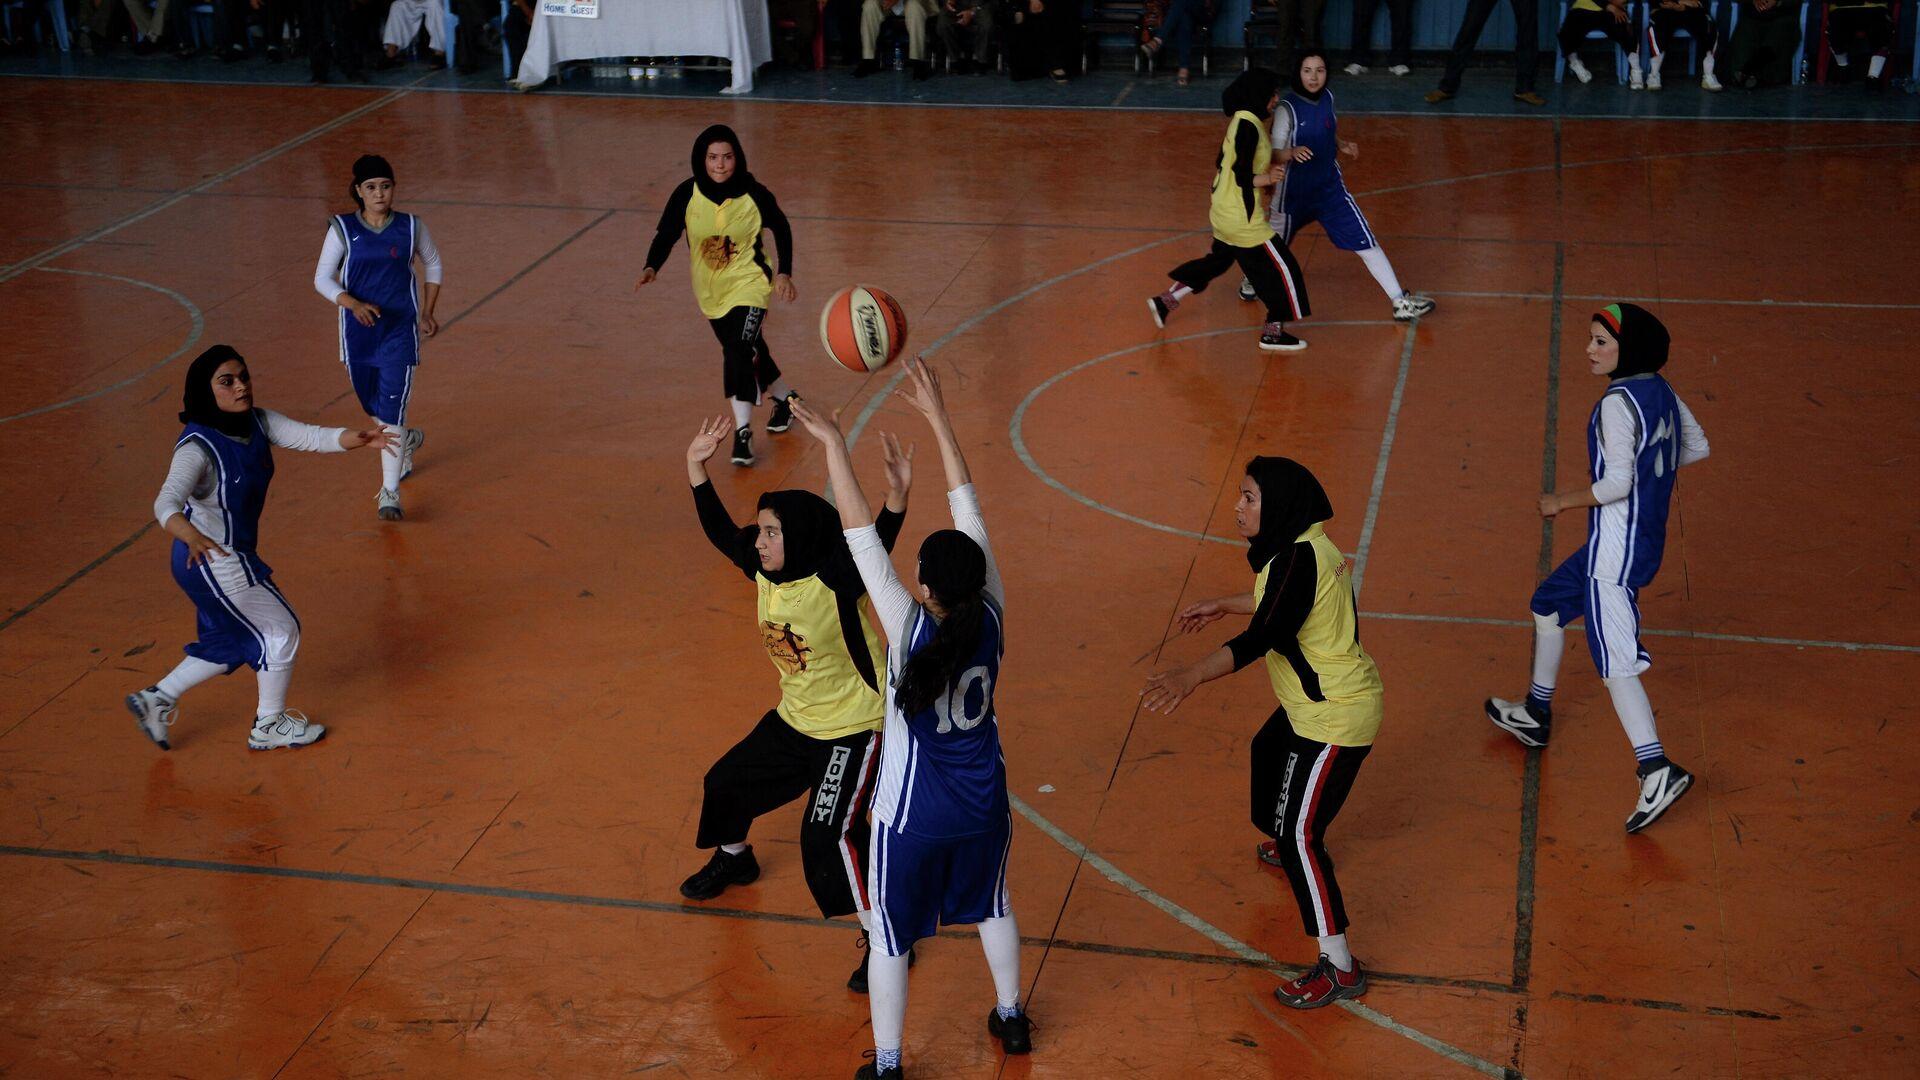 Prijateljska utakmica avganistanskih košarkašica iz Herata i Kabula - Sputnik Srbija, 1920, 08.09.2021